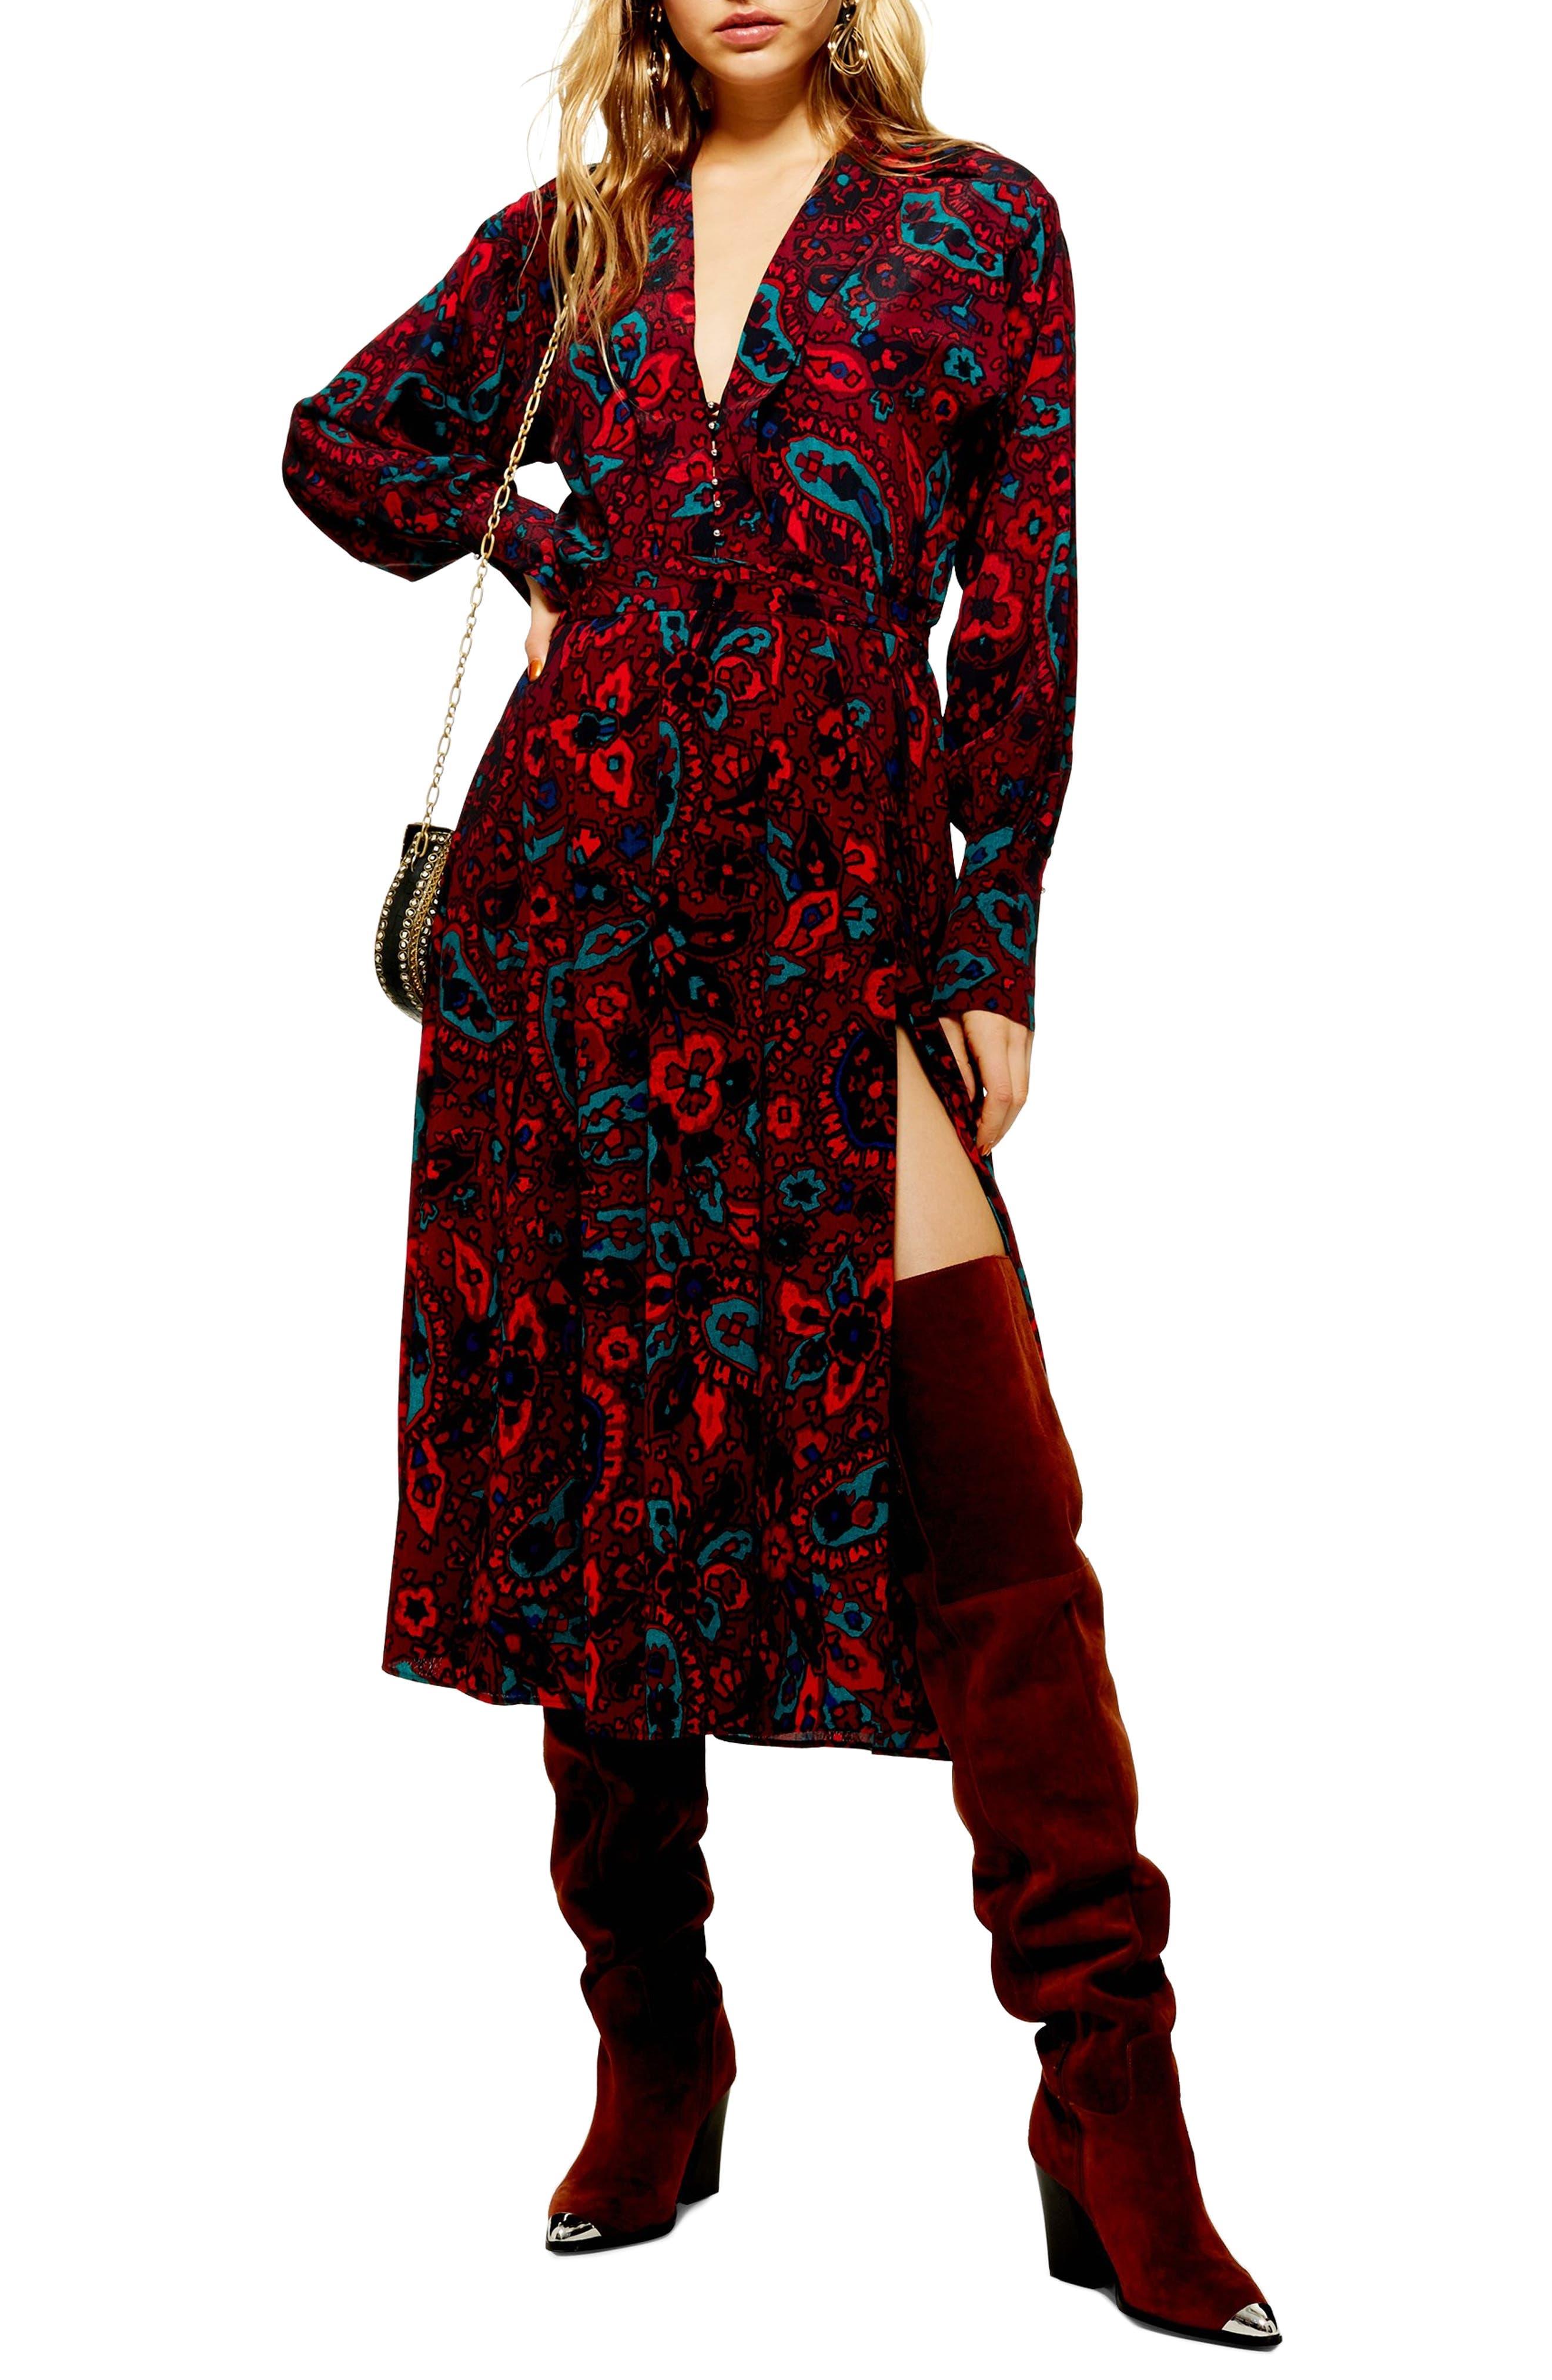 TOPSHOP, Paisley Oversize Shirtdress, Main thumbnail 1, color, 640